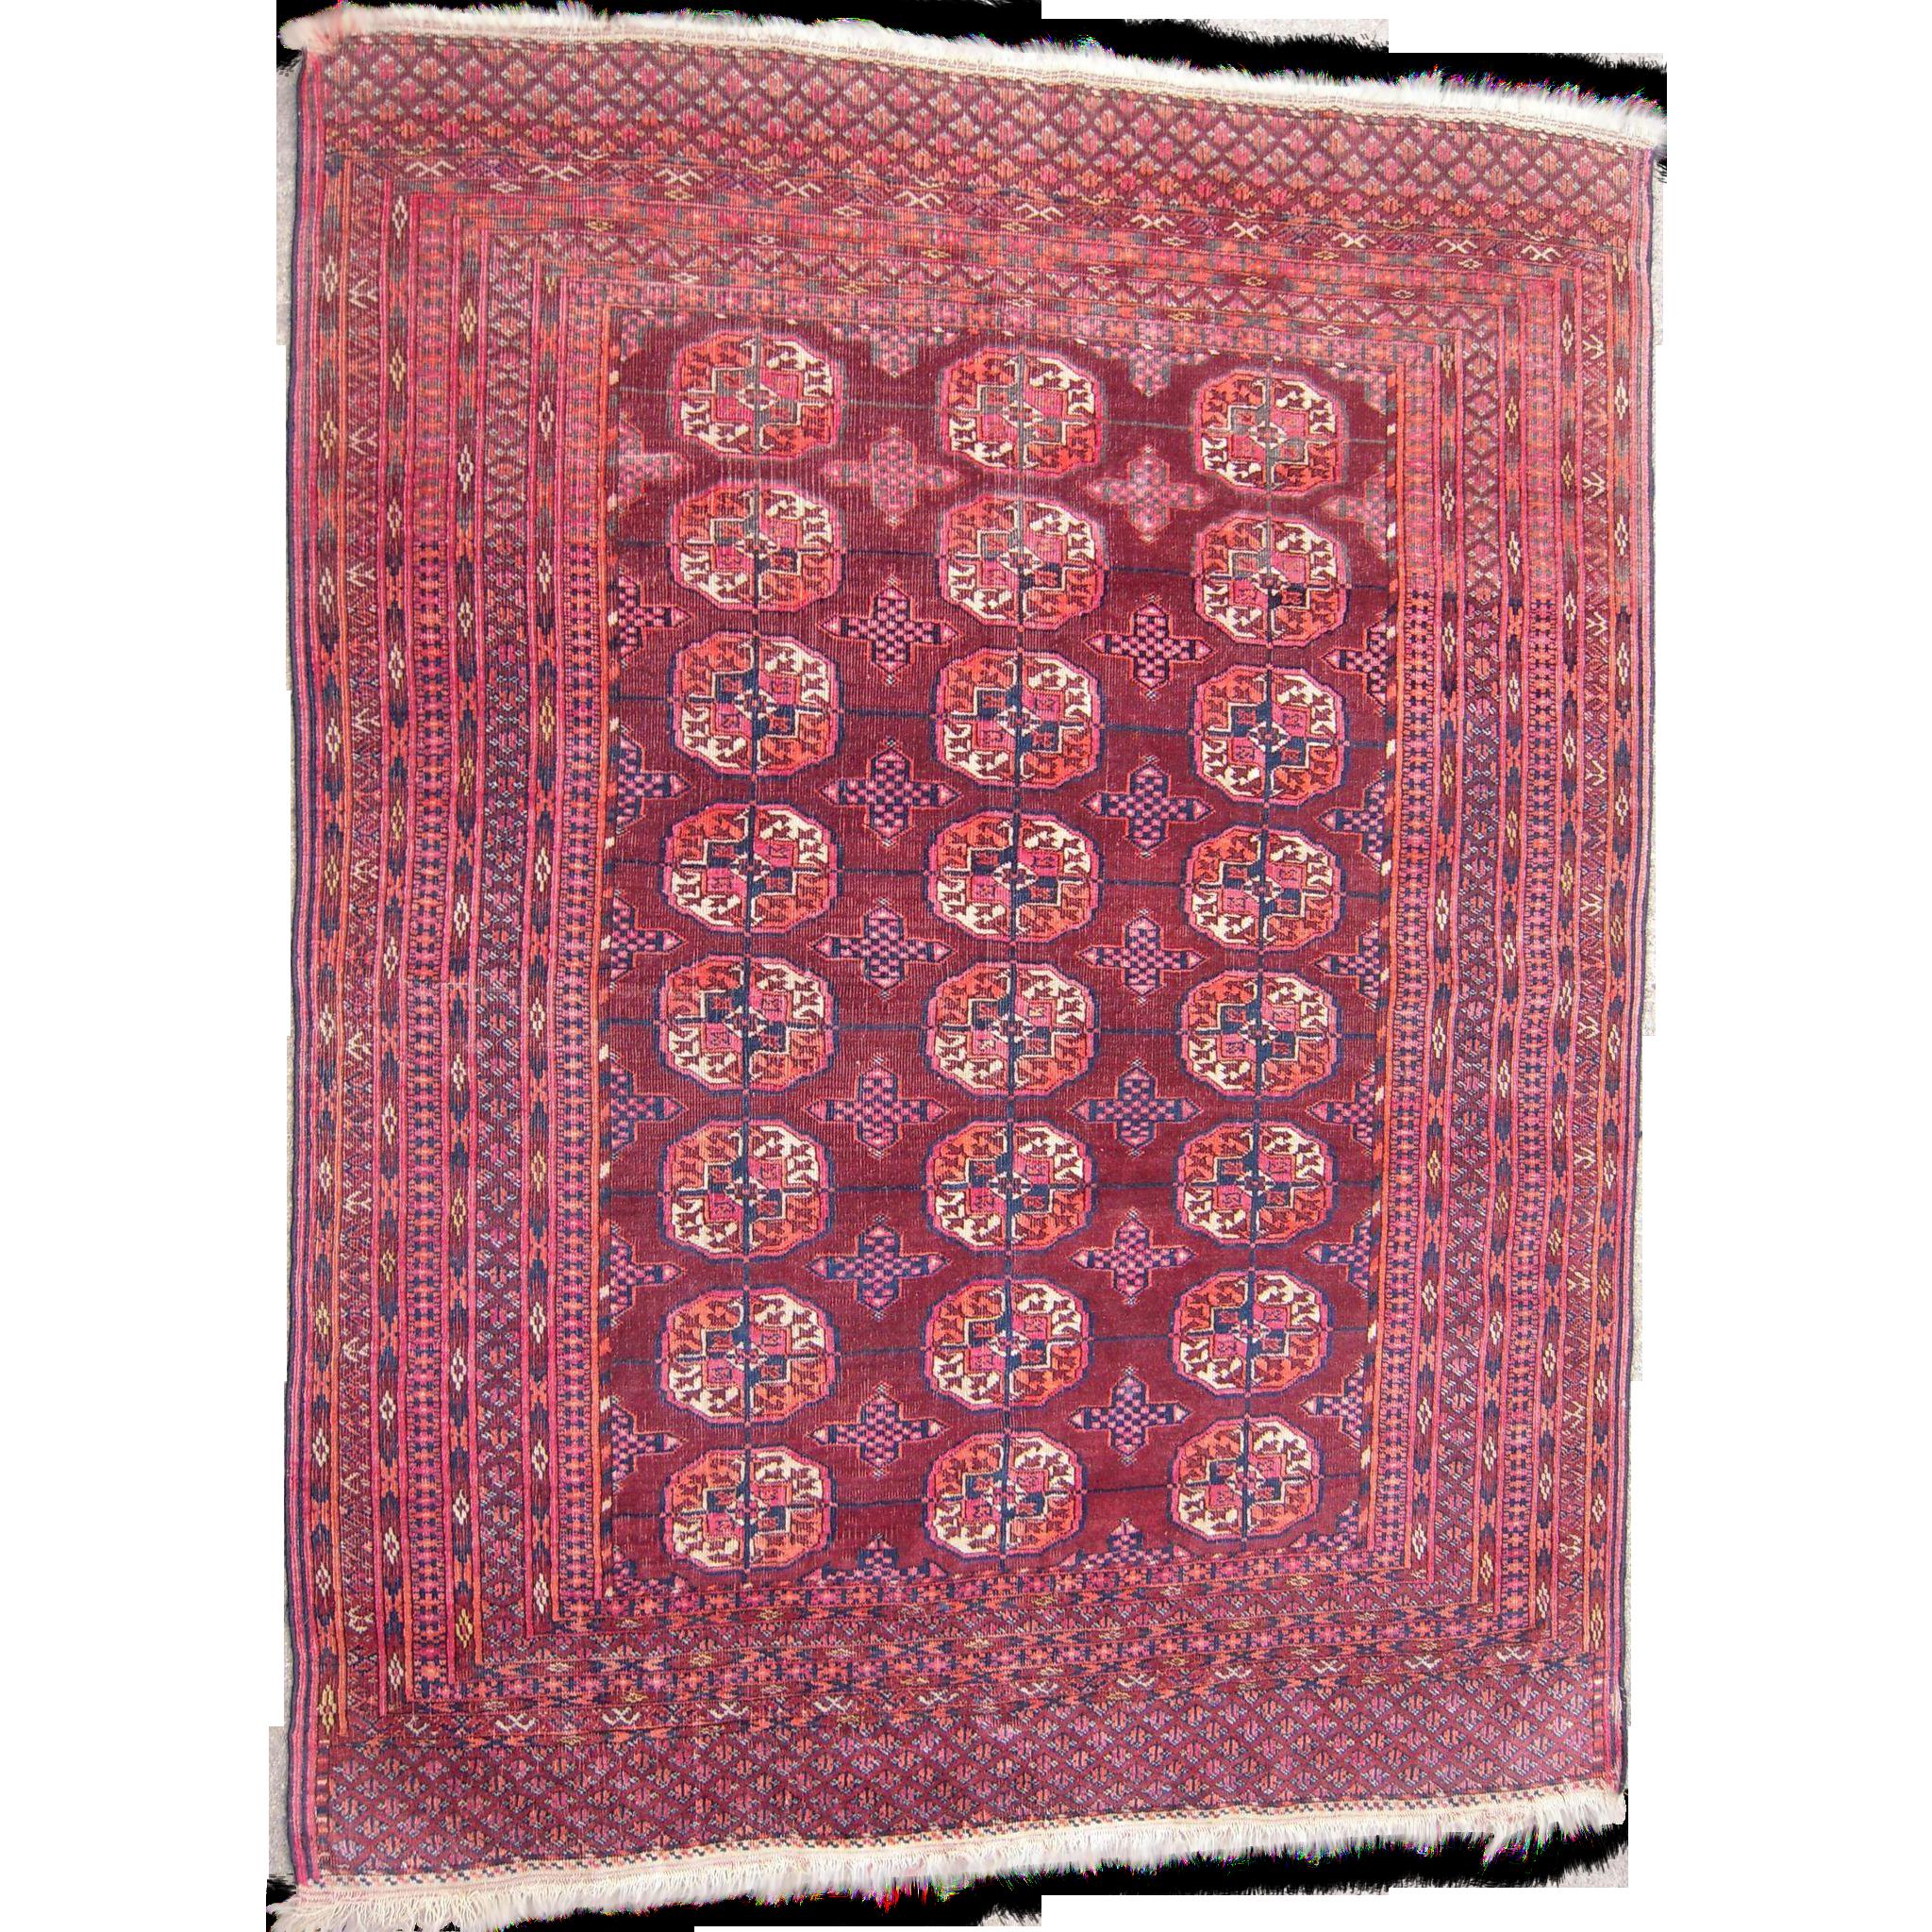 Antique Turkoman Rug: C1890s Antique Turkoman Persian Rug 4' X 5' From